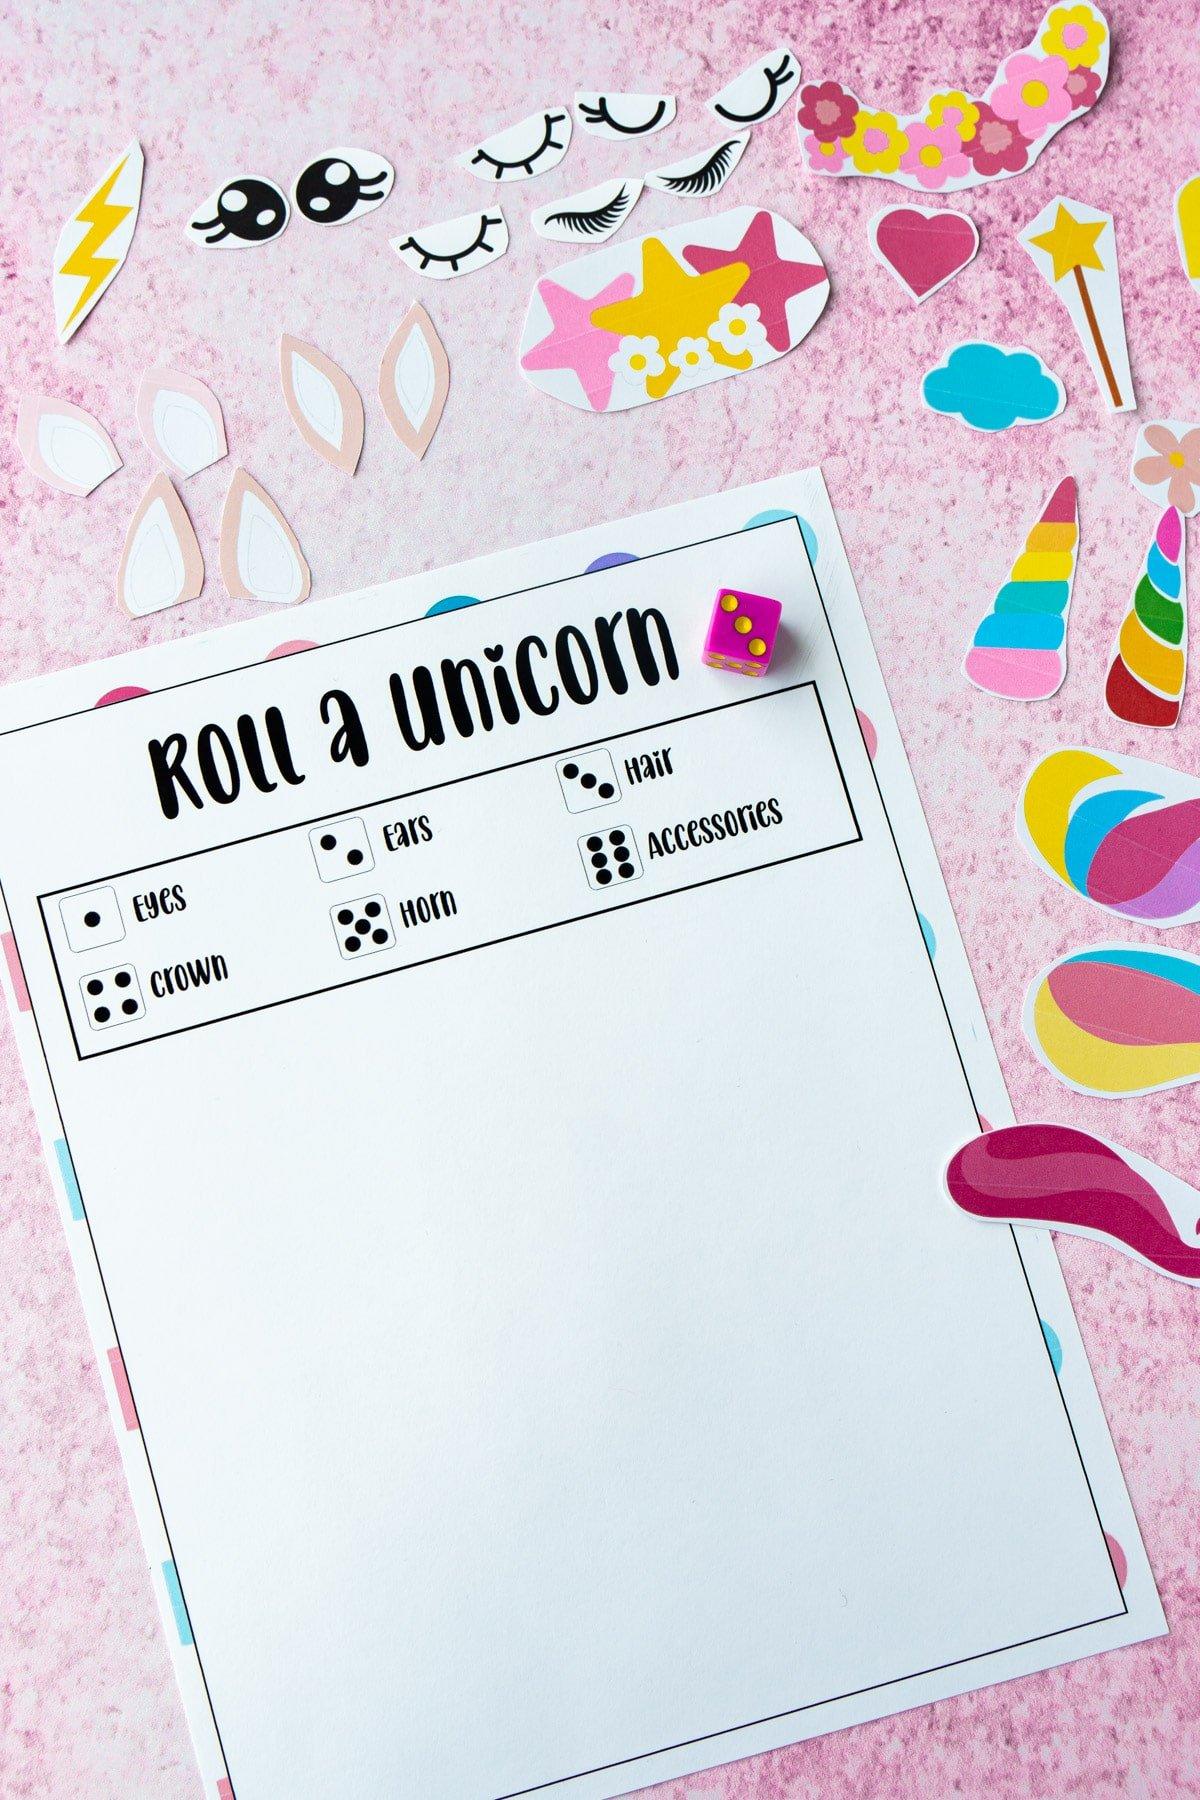 Blank roll a unicorn game sheet